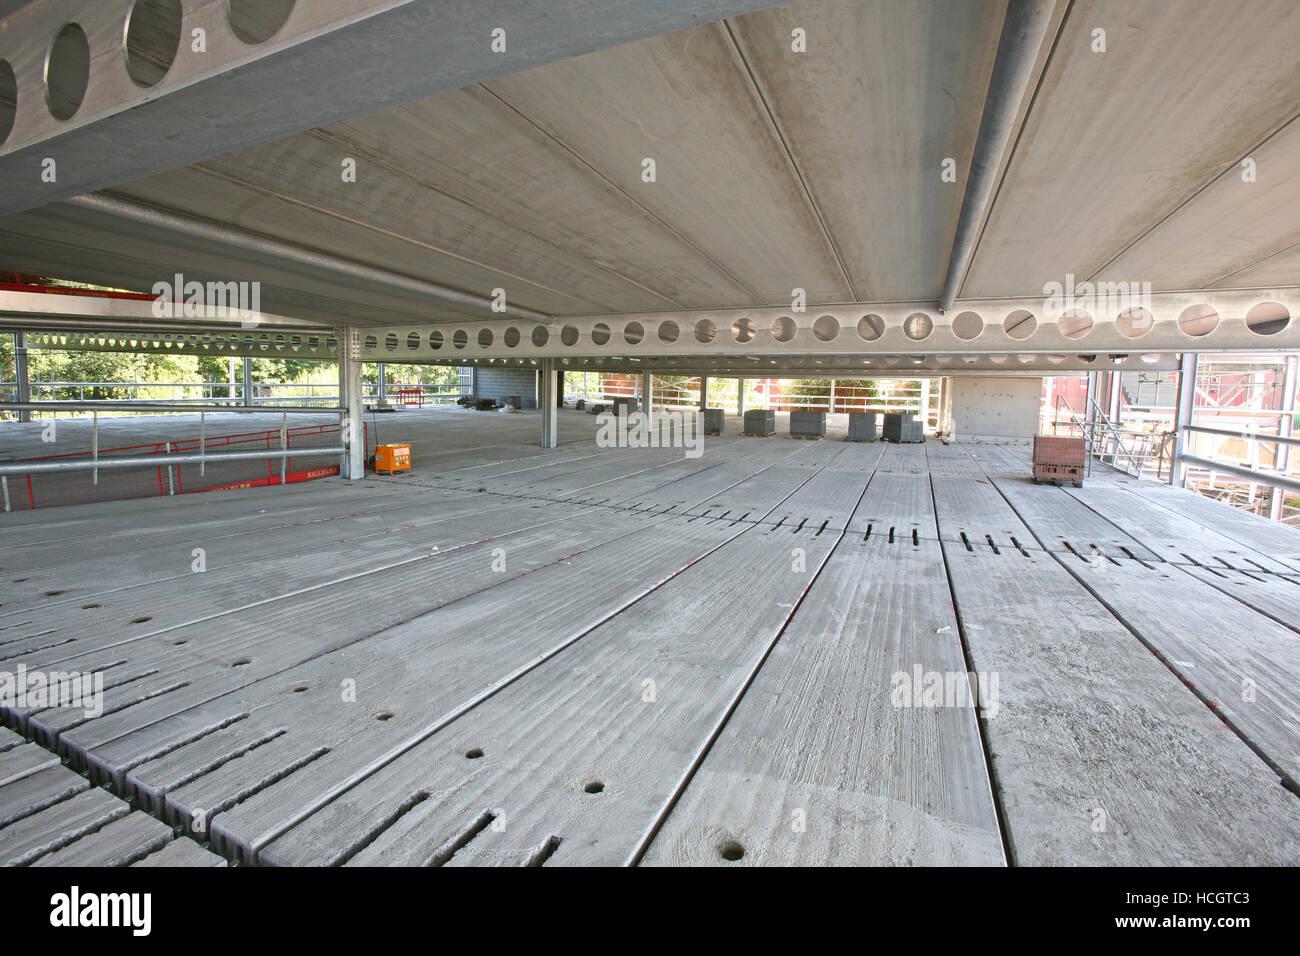 Construction site, PCC precast plank floor deck, structural steel ...